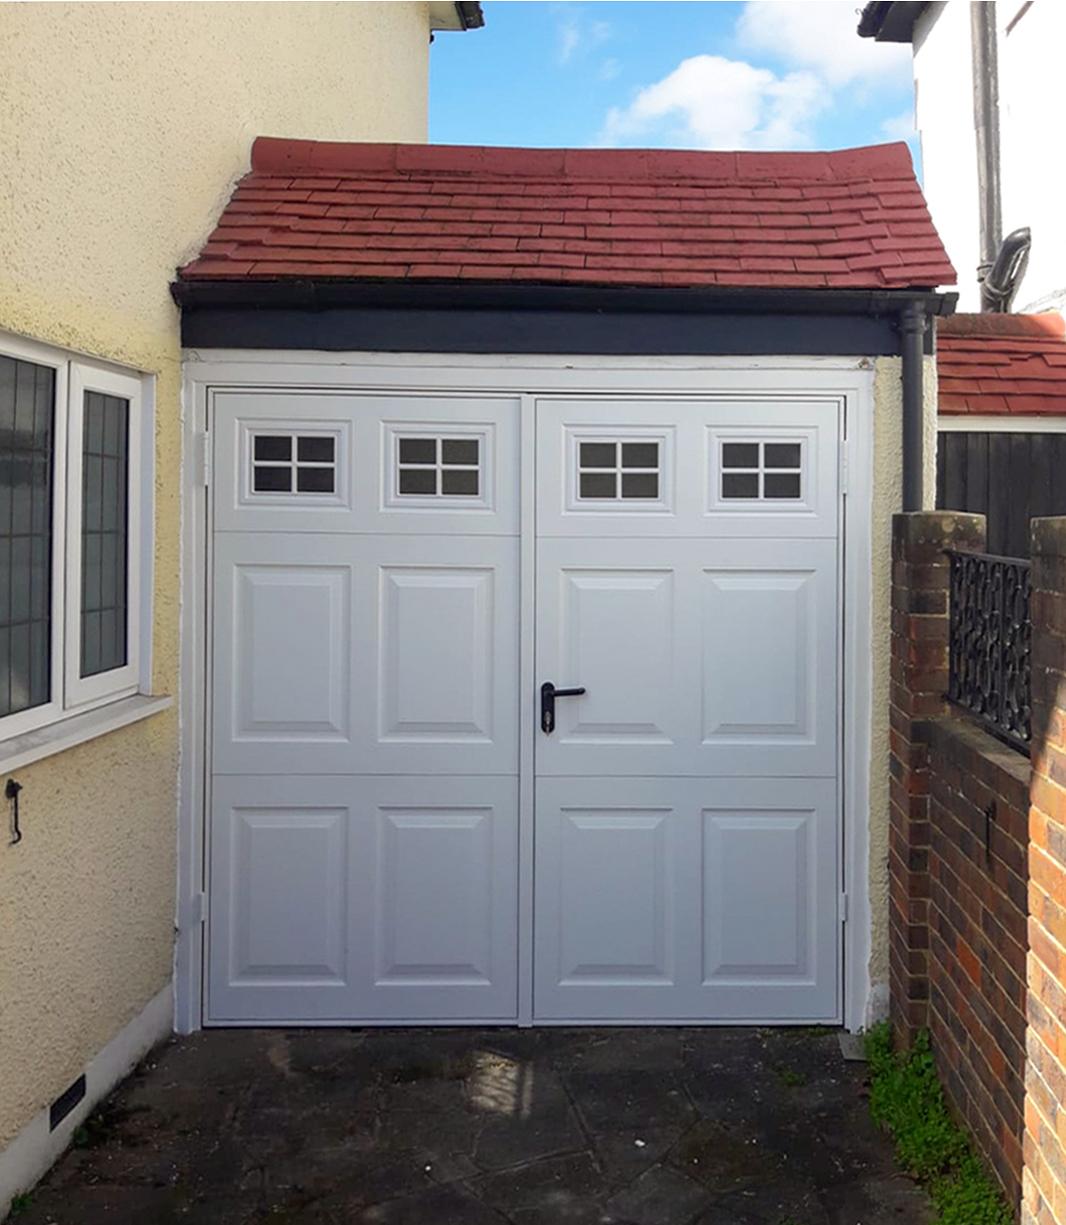 Garador Beaumont Side Hinged Garage Door Finished in White